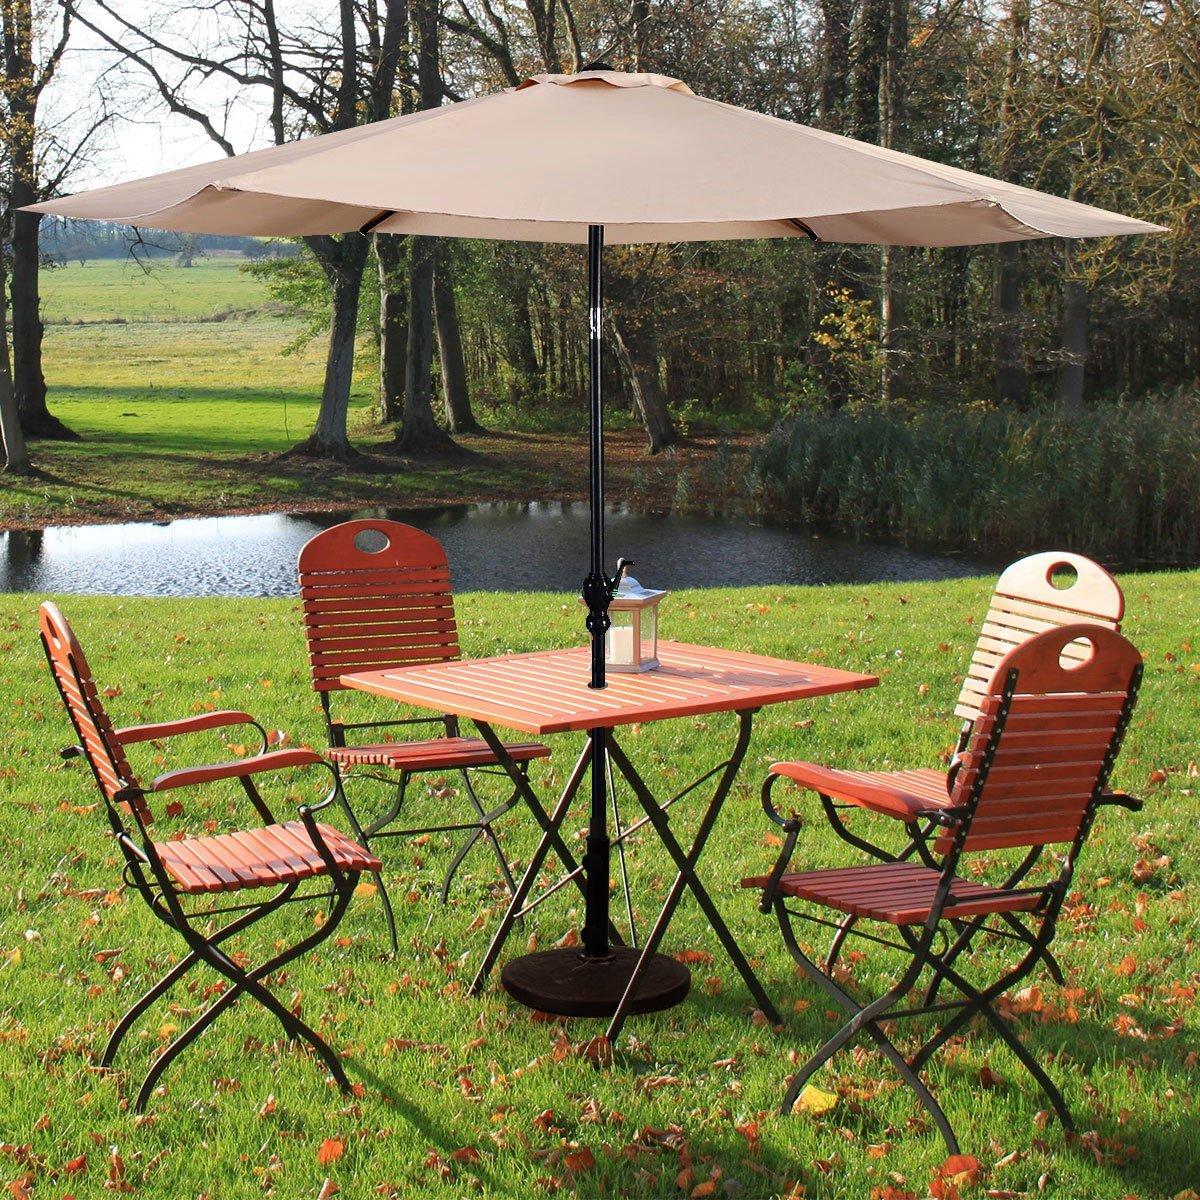 Giantex 10ft Solar Patio Umbrella Sunbrella Without Lights, 6 Ribs Market Steel Tilt w Crank for Garden, Deck, Backyard, Pool Indoor Outdoor Use